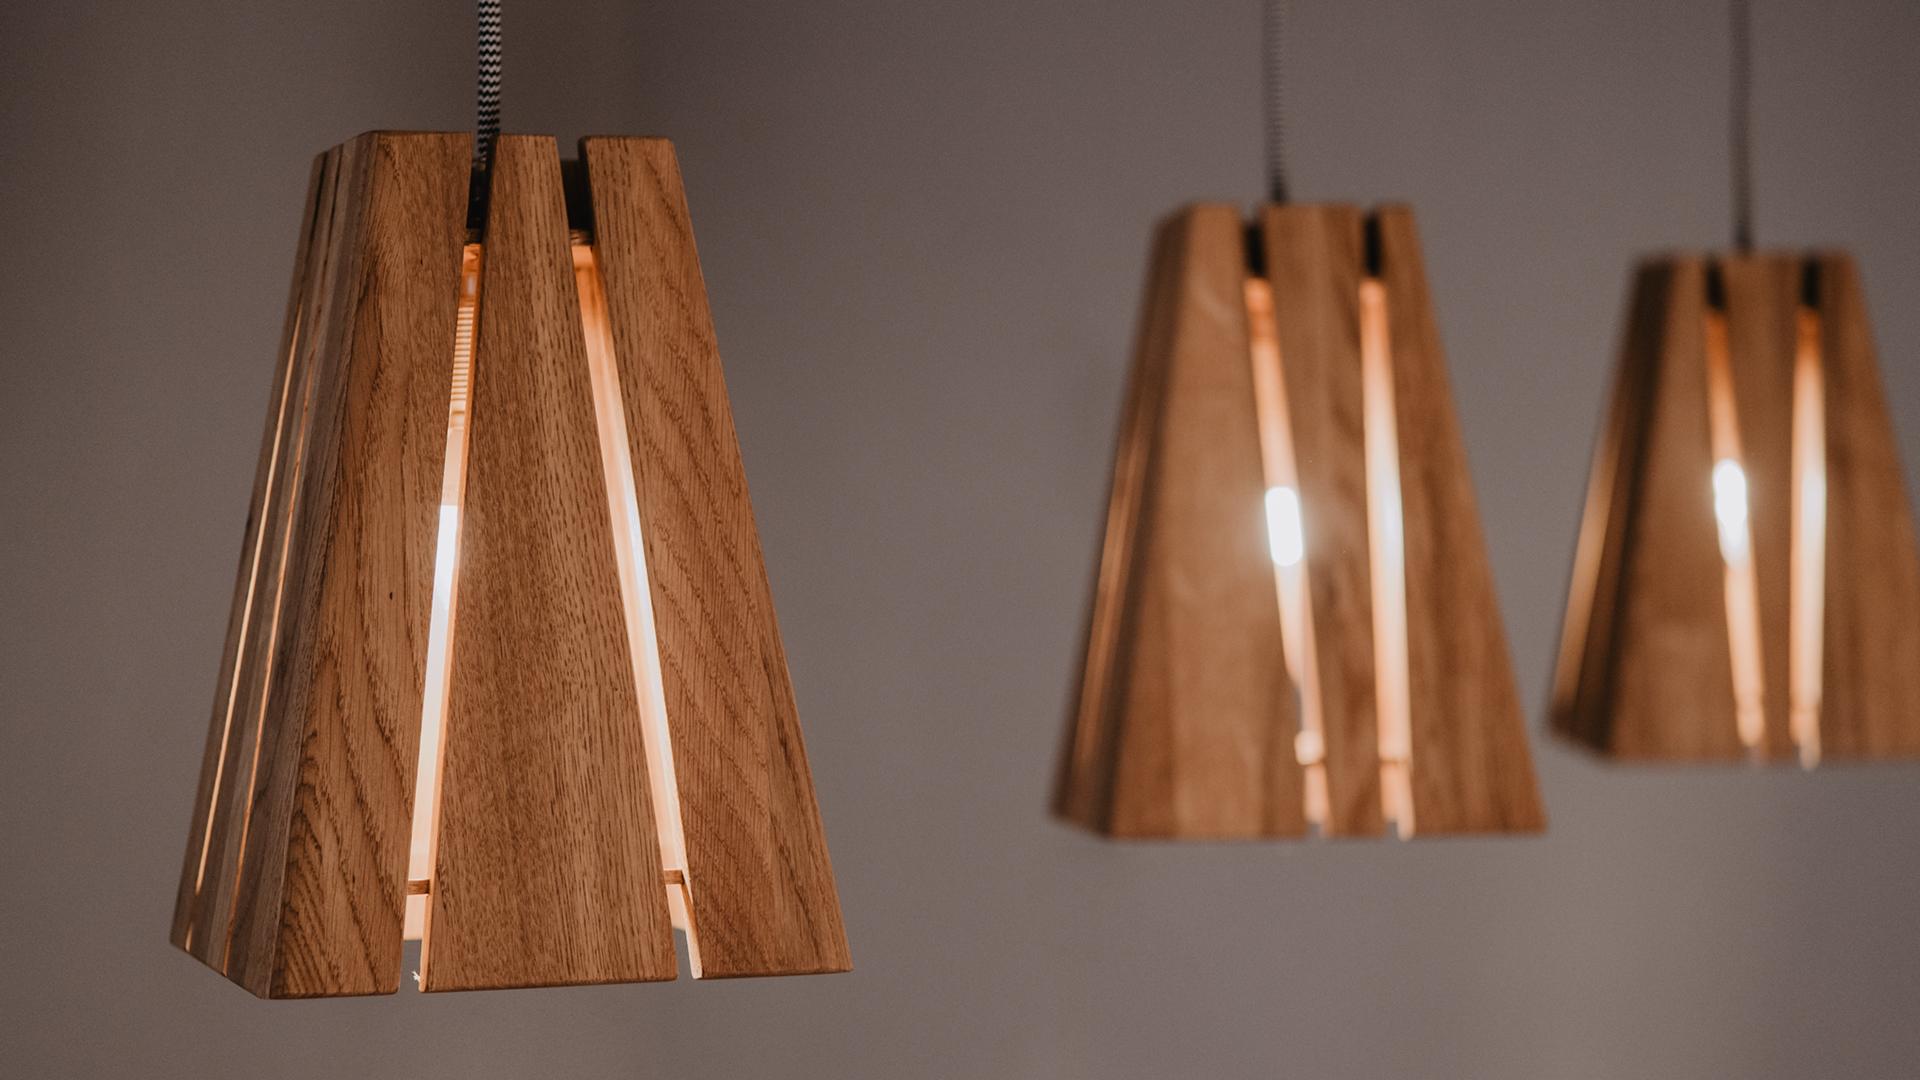 Tischlerei HolzWerk - feine moebel - Lampe Lambert Dreifach